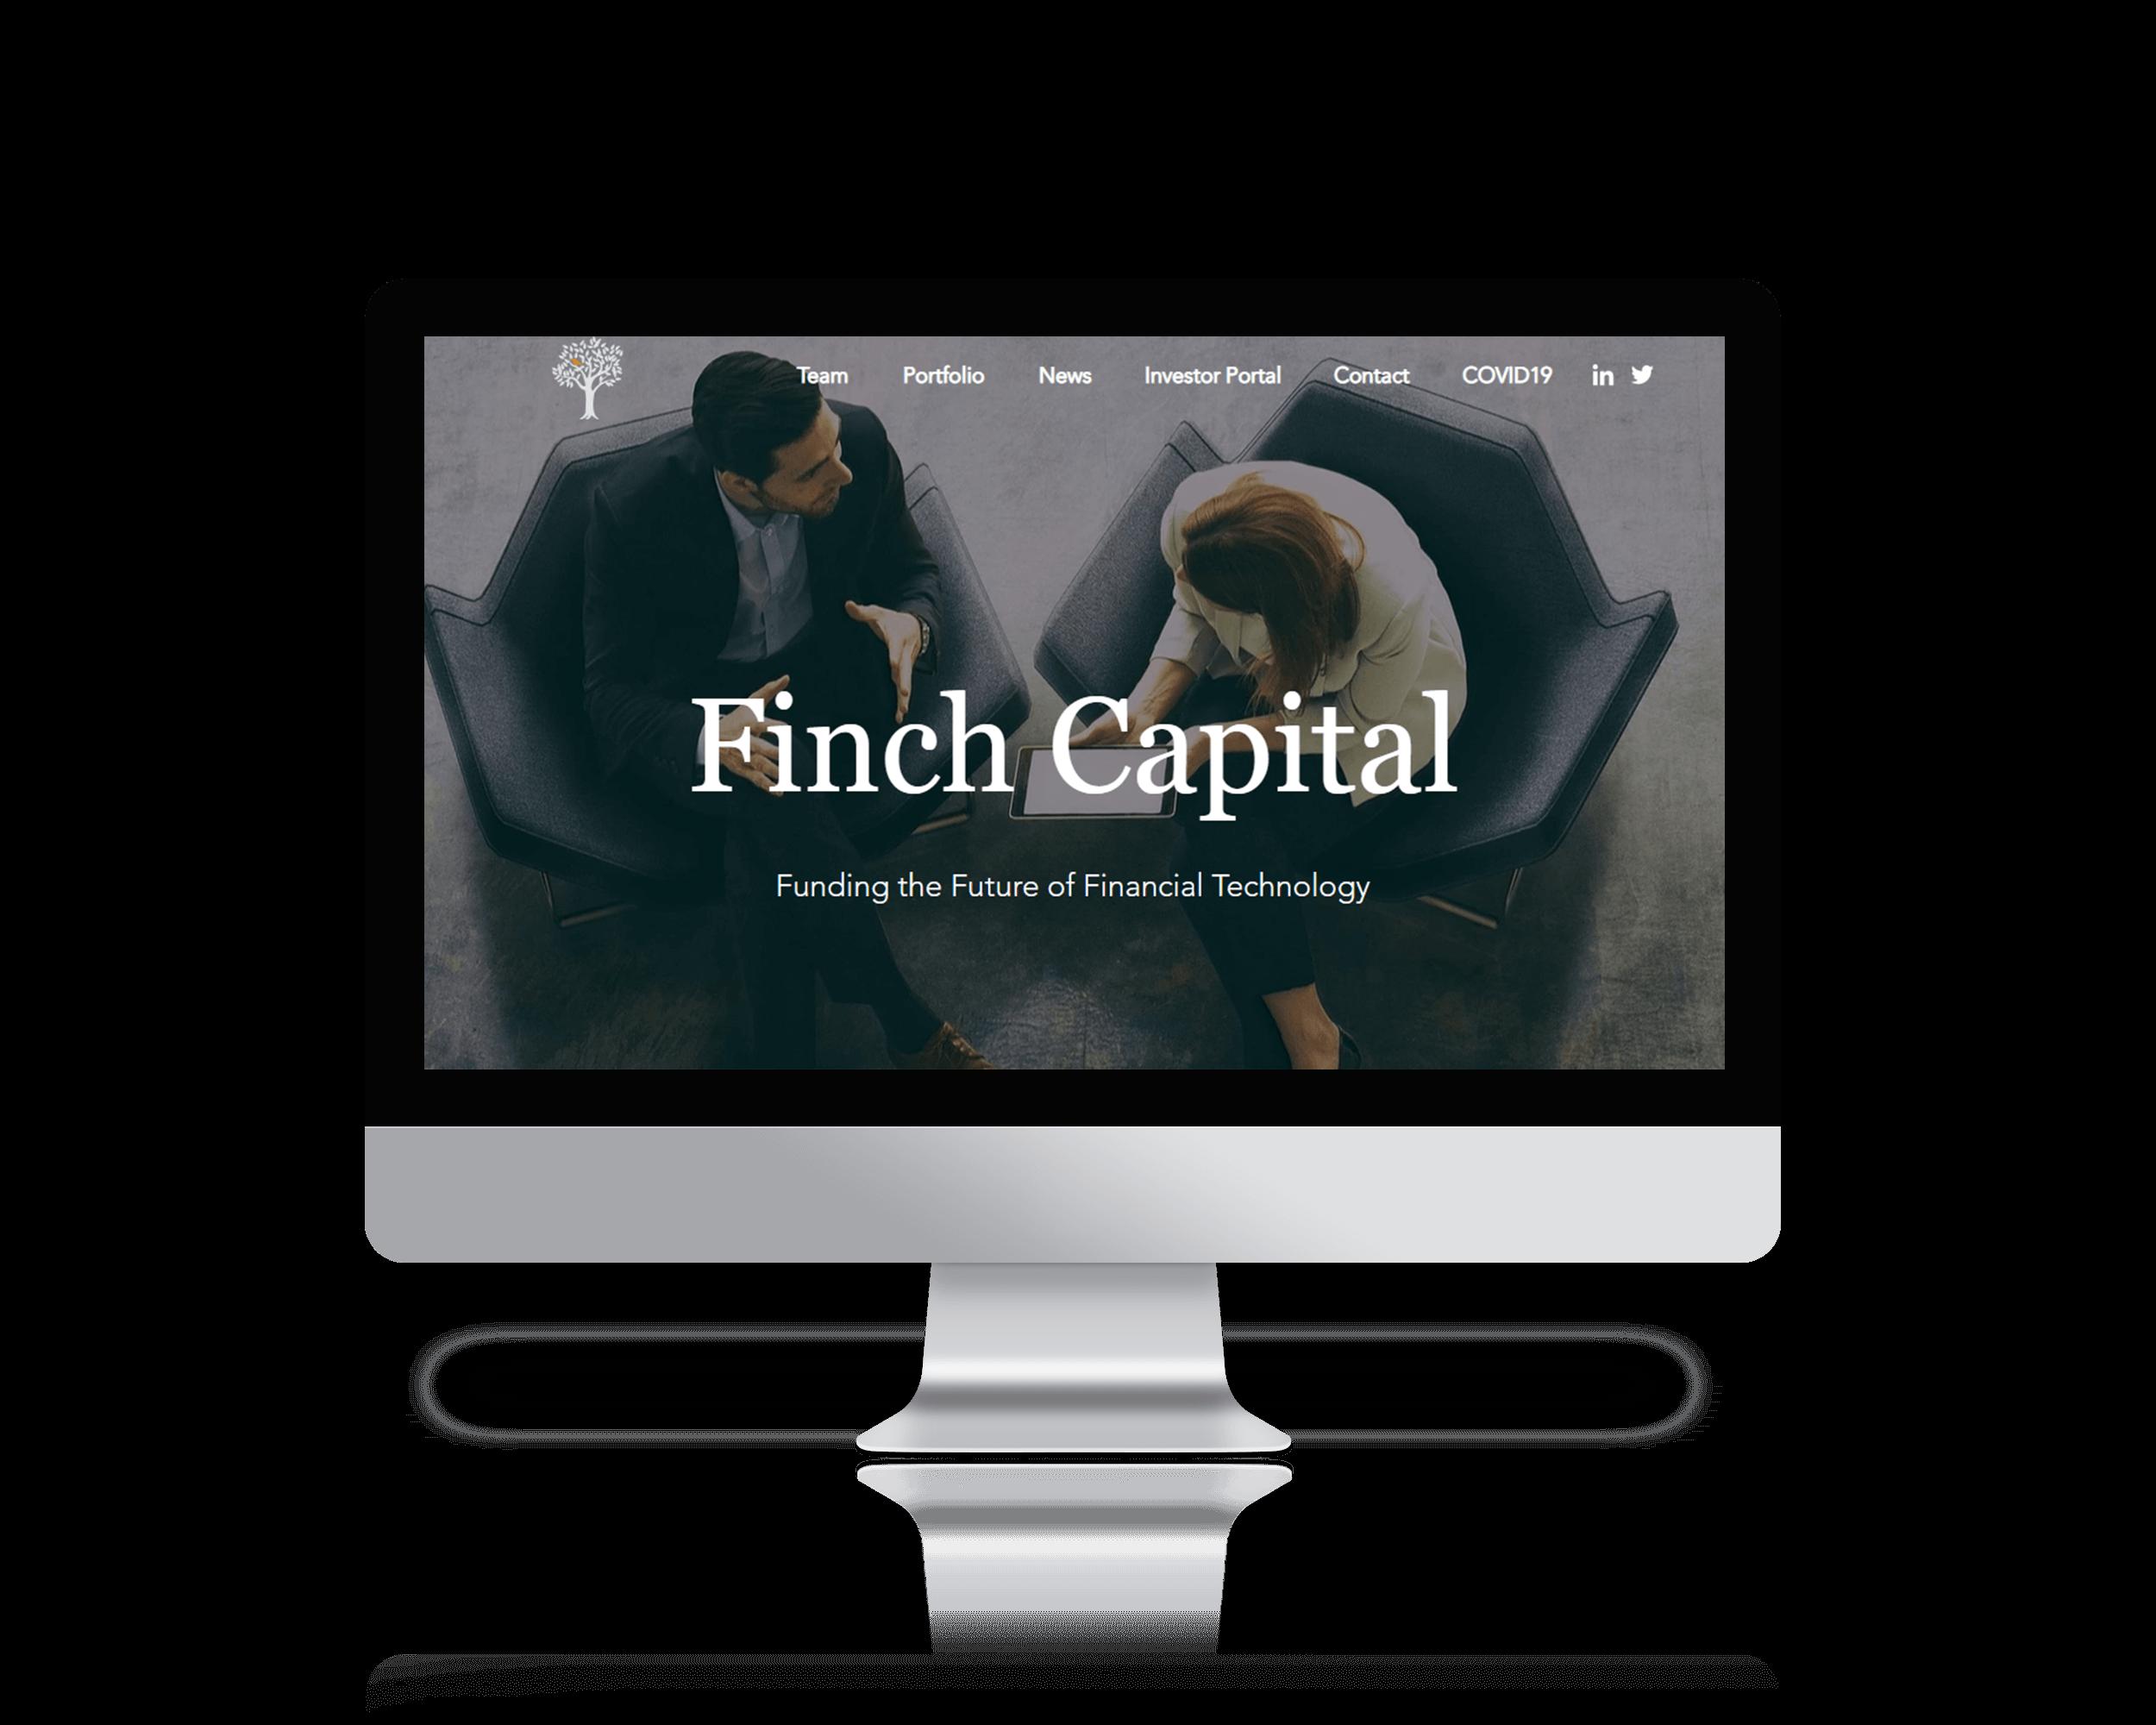 fintch capital